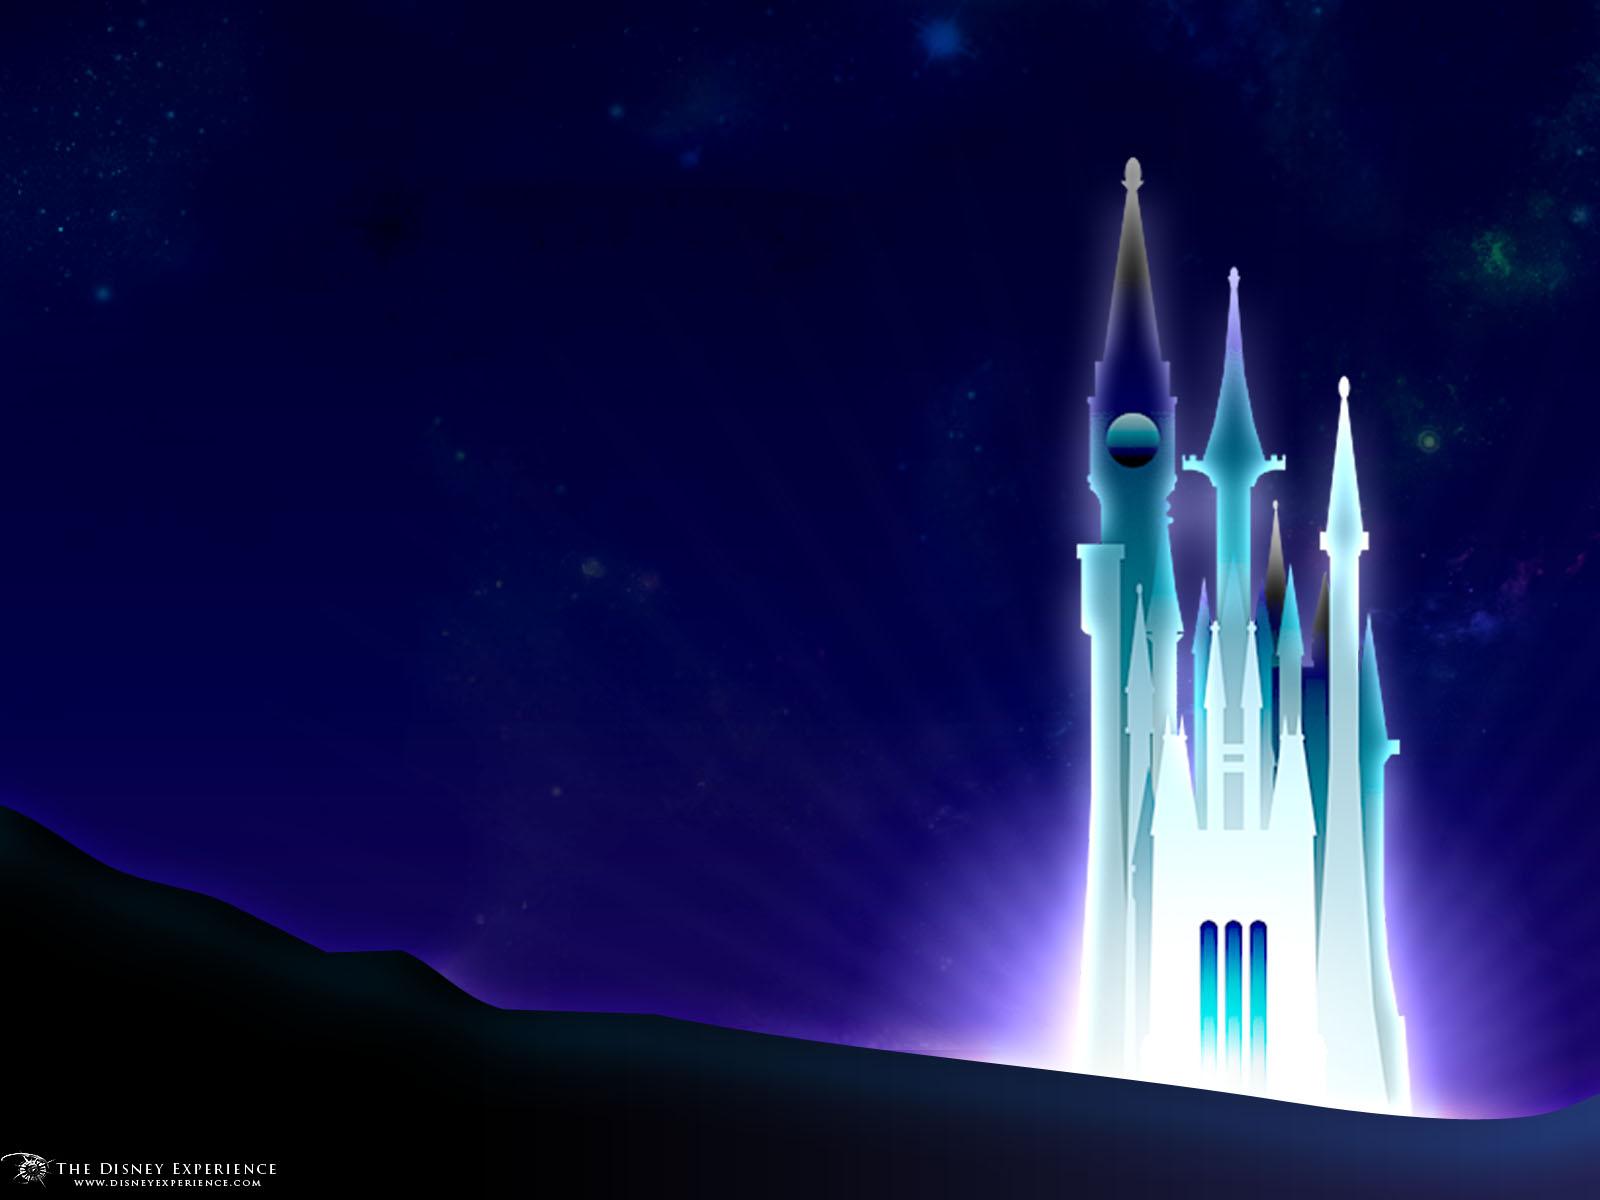 Download Wallpaper Mac Disney - castle1_1600  Picture_6474100.jpg